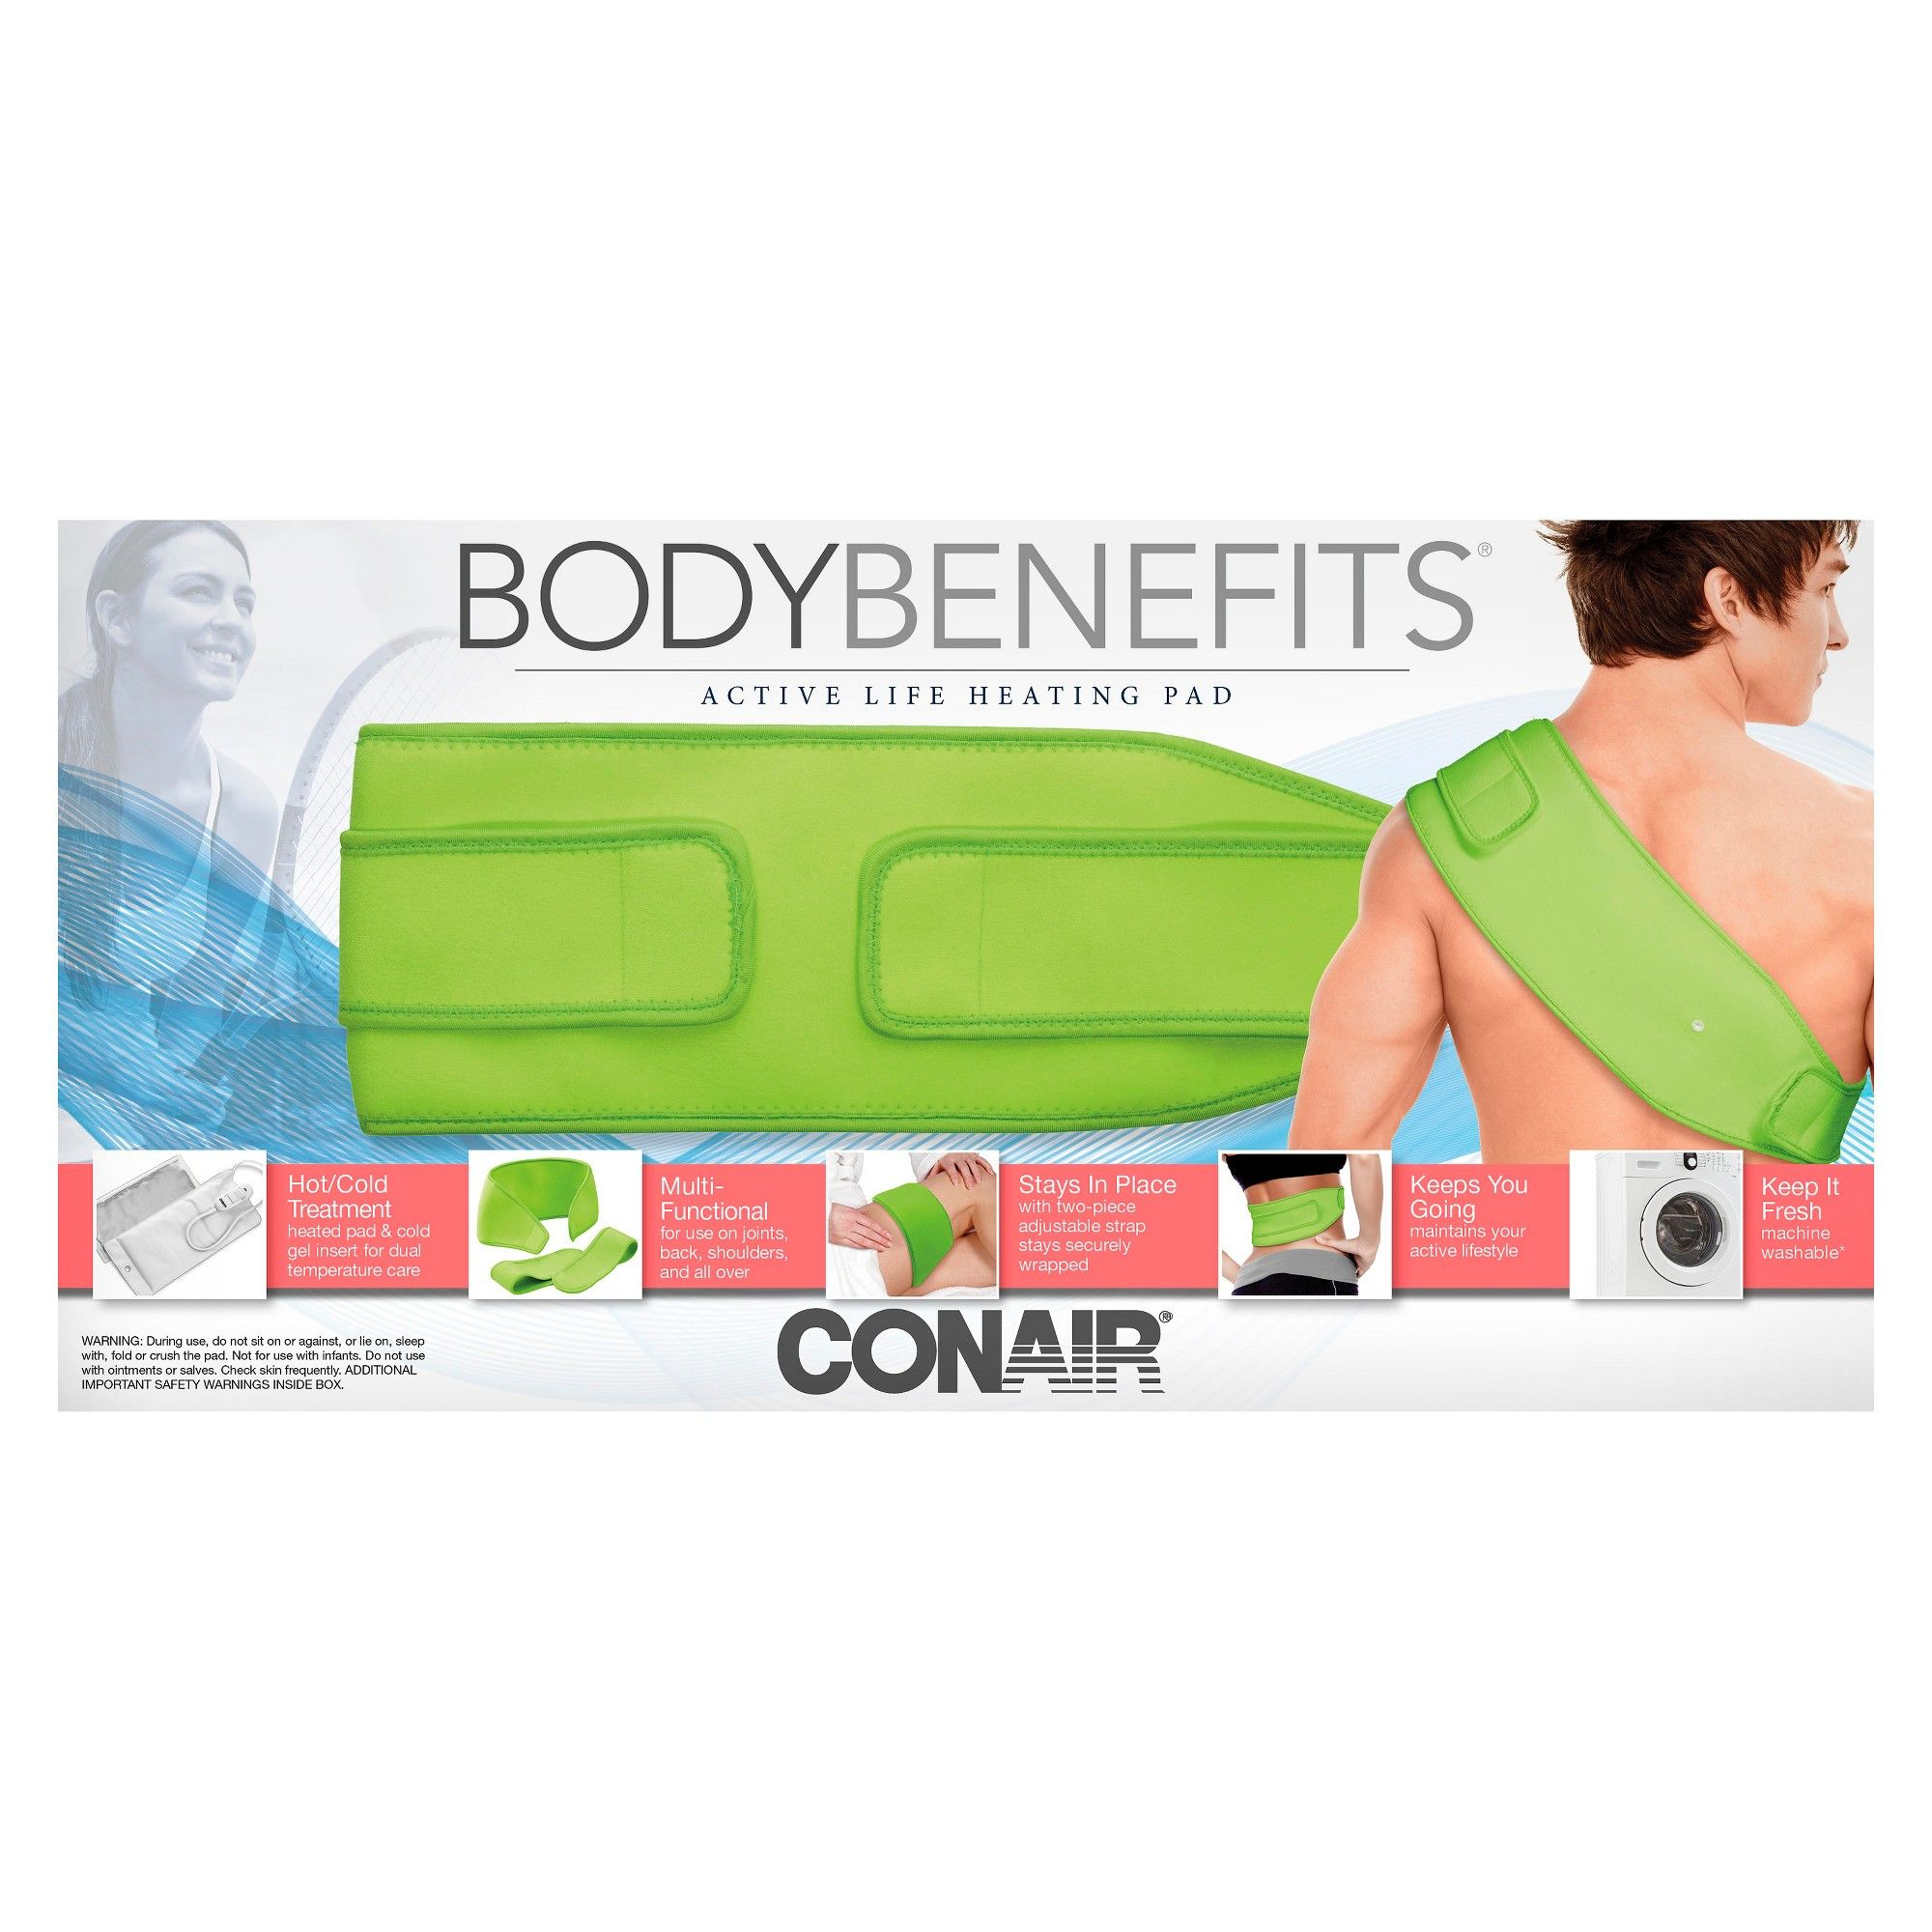 conair heating pad - green | products